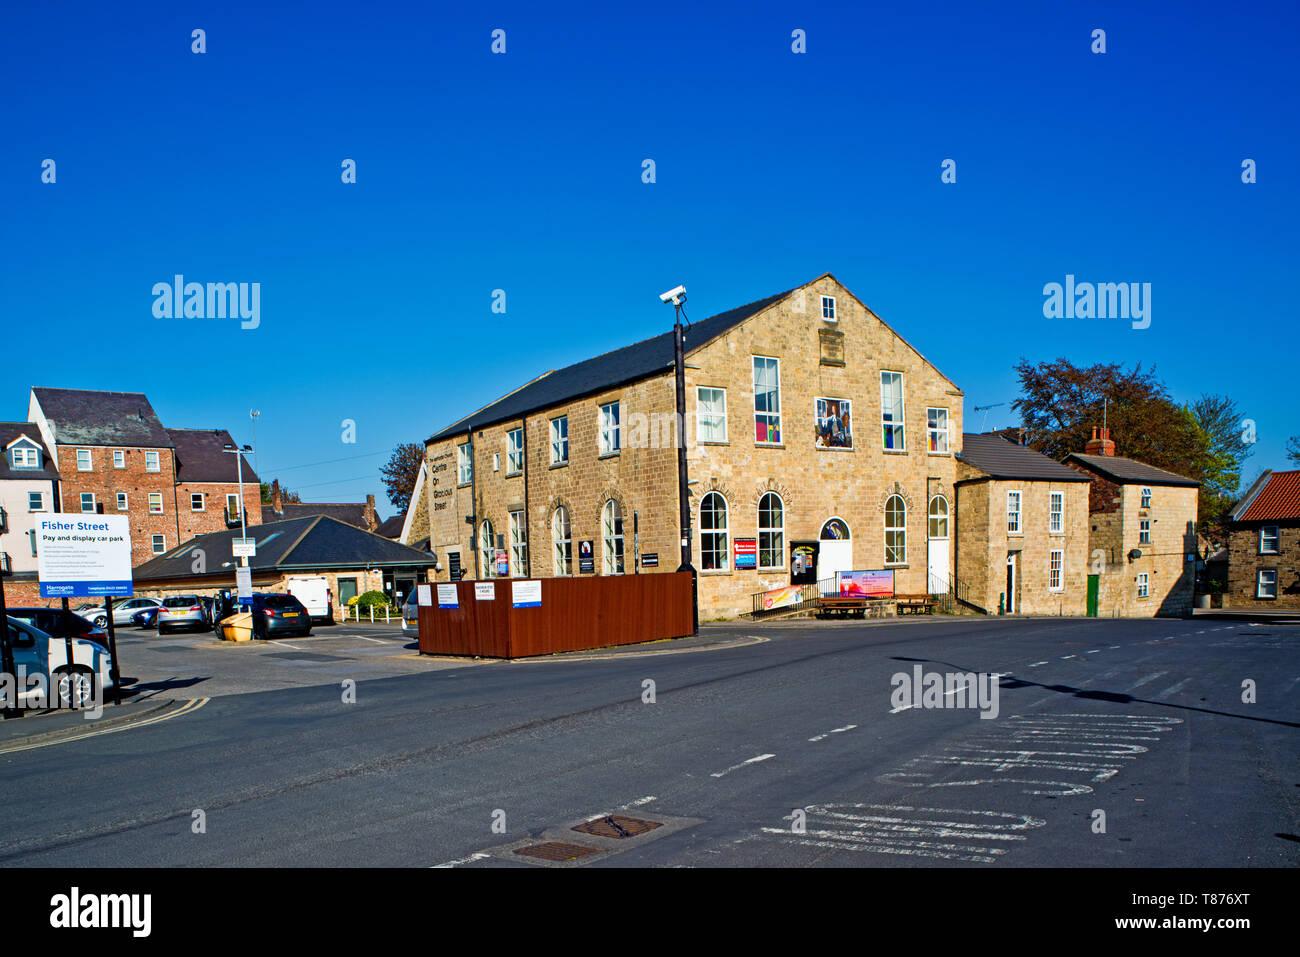 Methodist Chapel, Fisher Street, Knaresborough, England - Stock Image